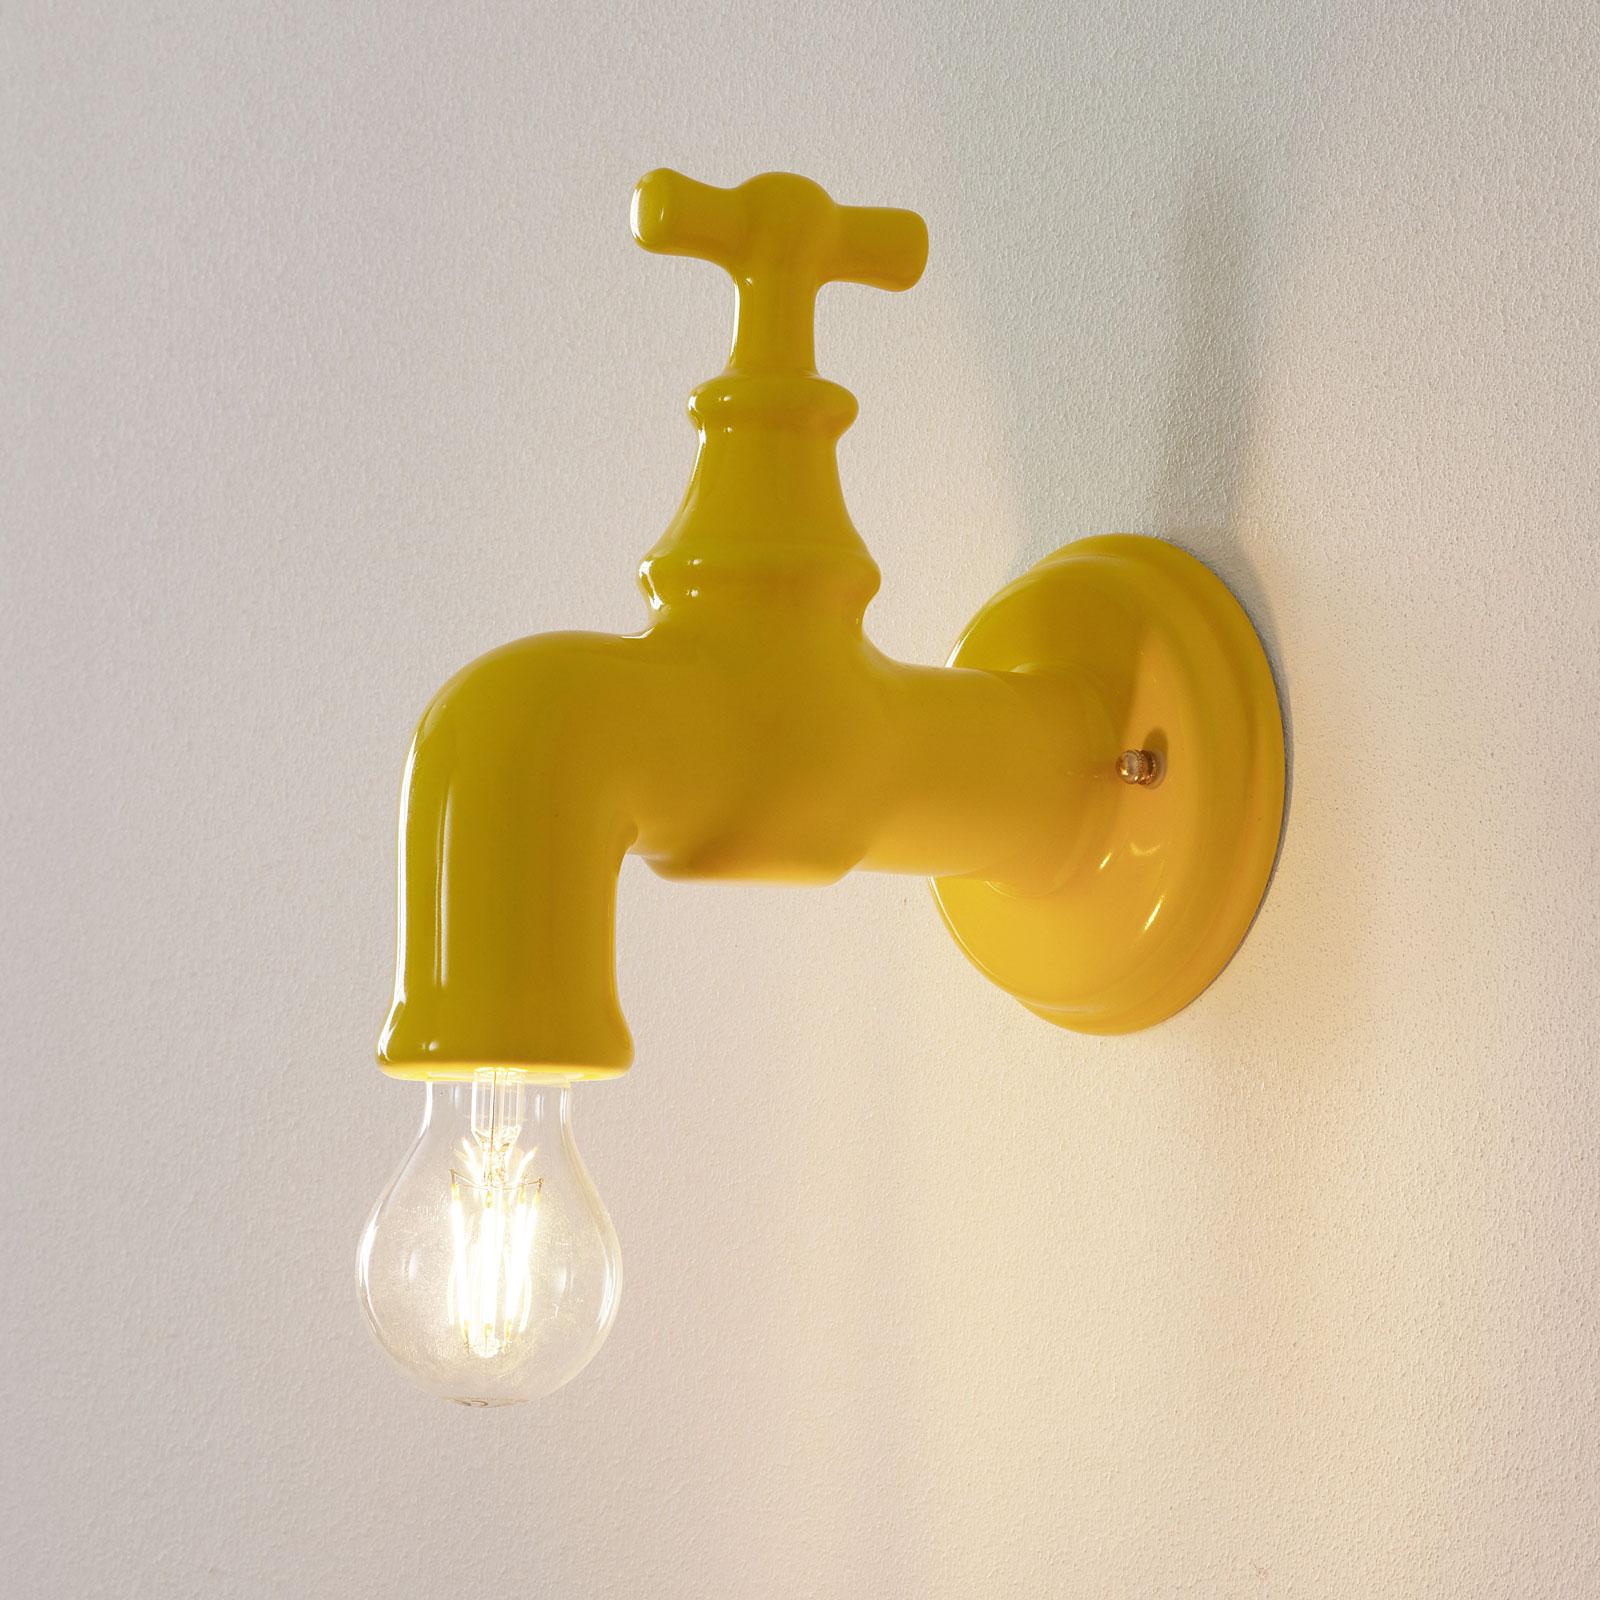 Applique en céramique A189, jaune brillante